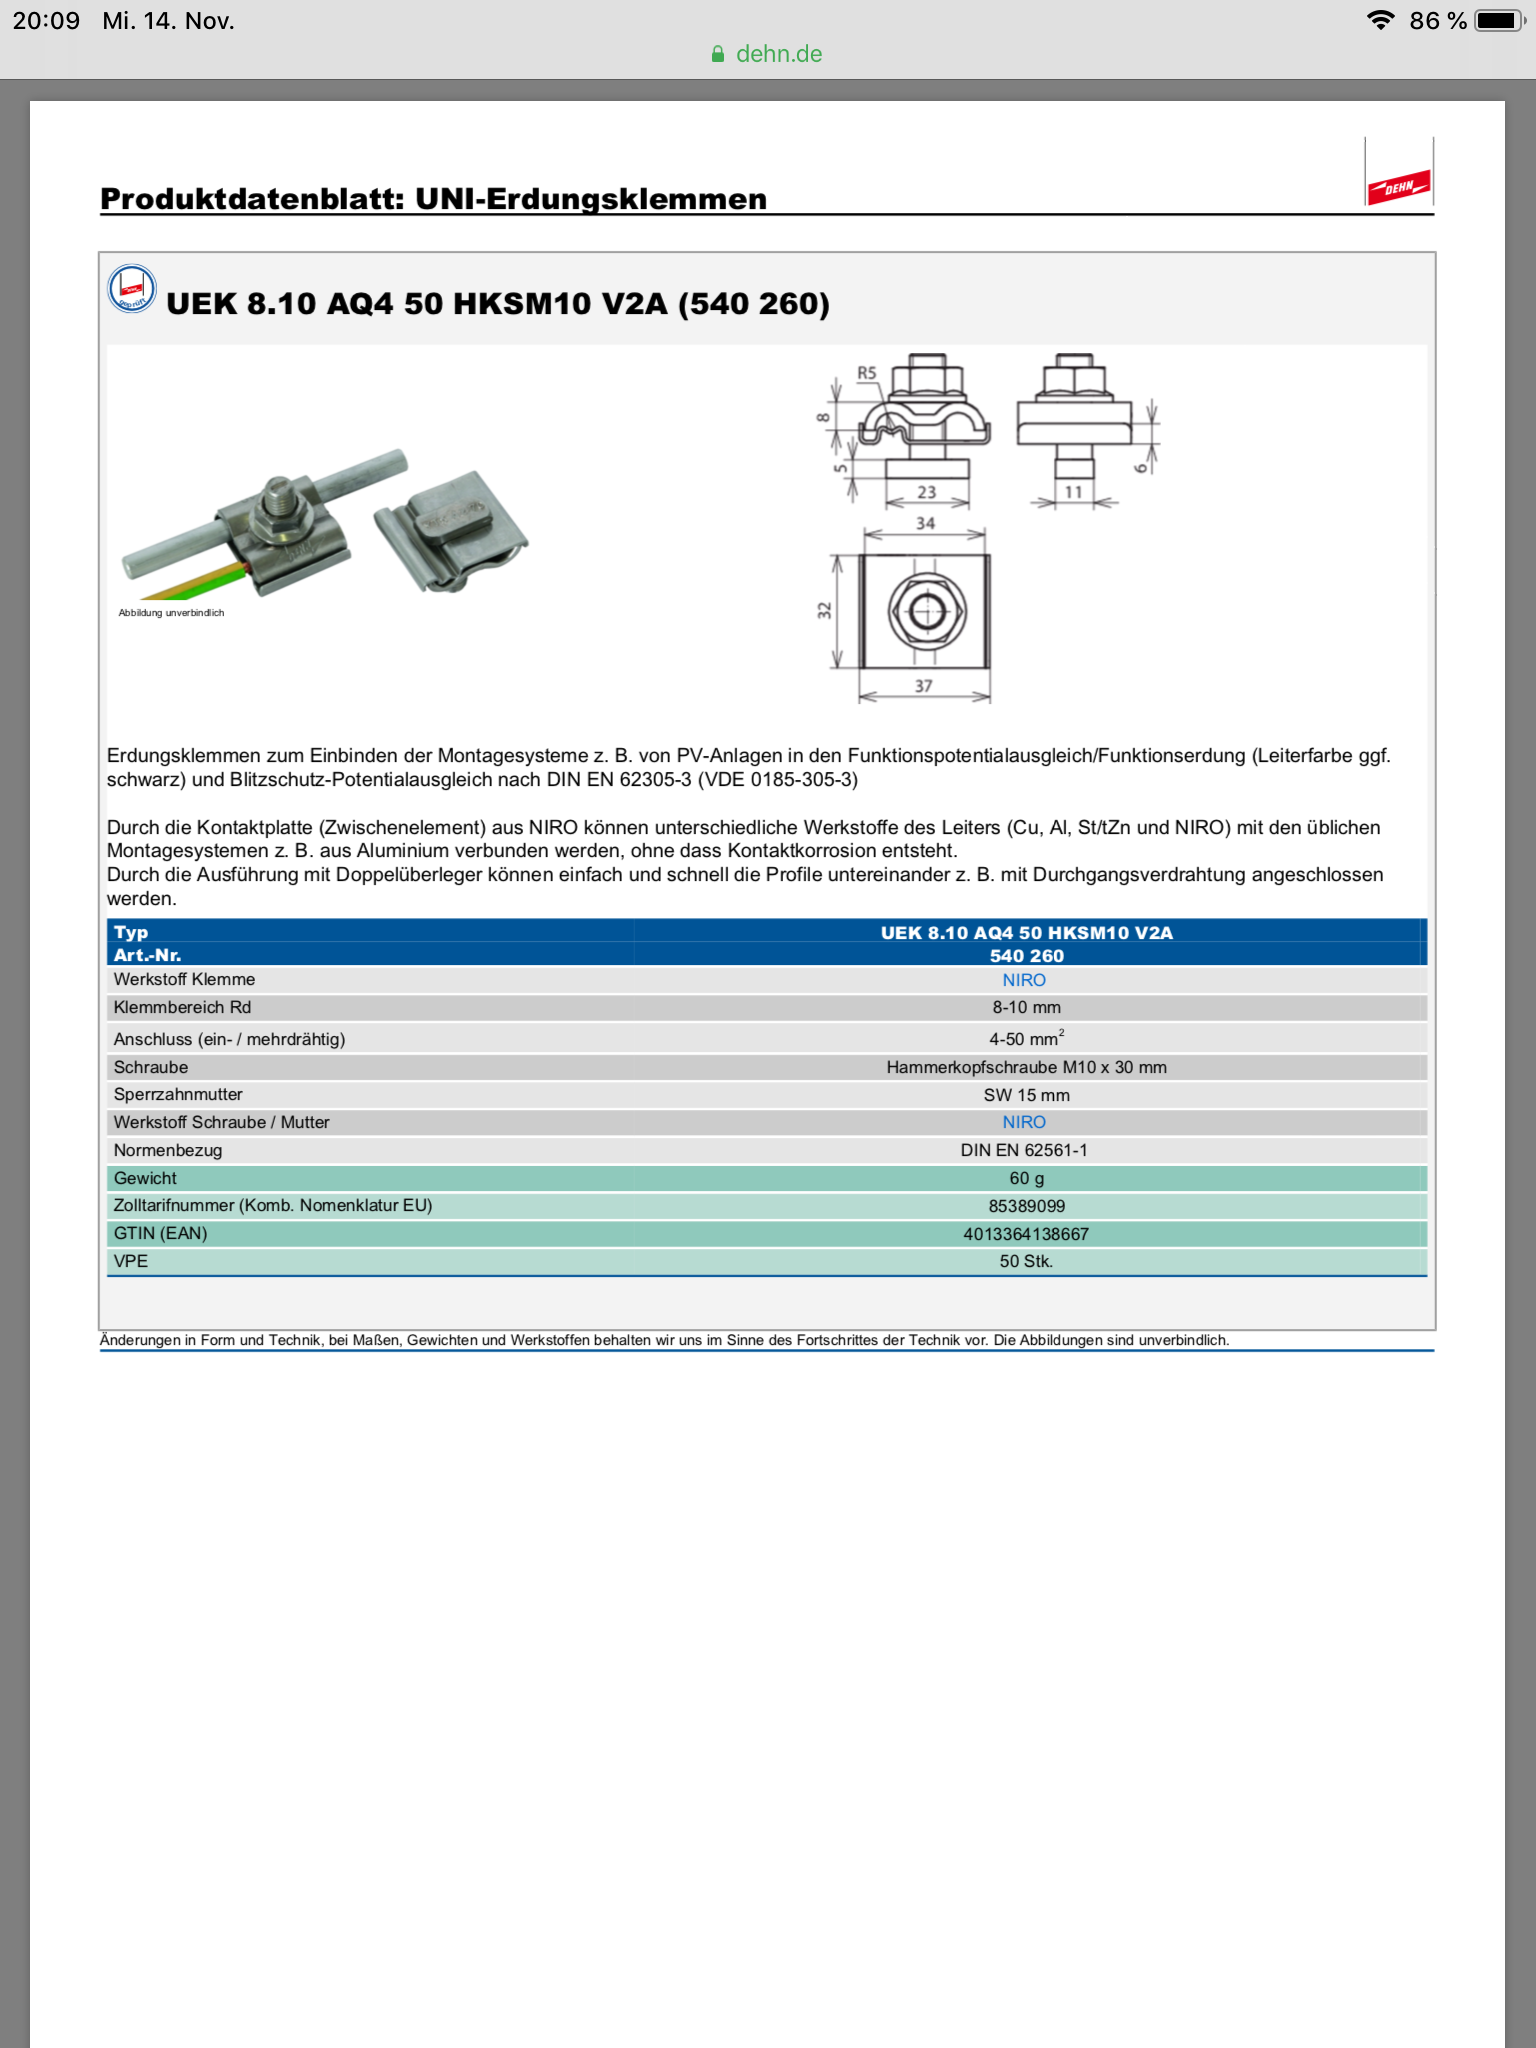 32B505B7-74BB-4D4E-A046-9CC0D302C165.png